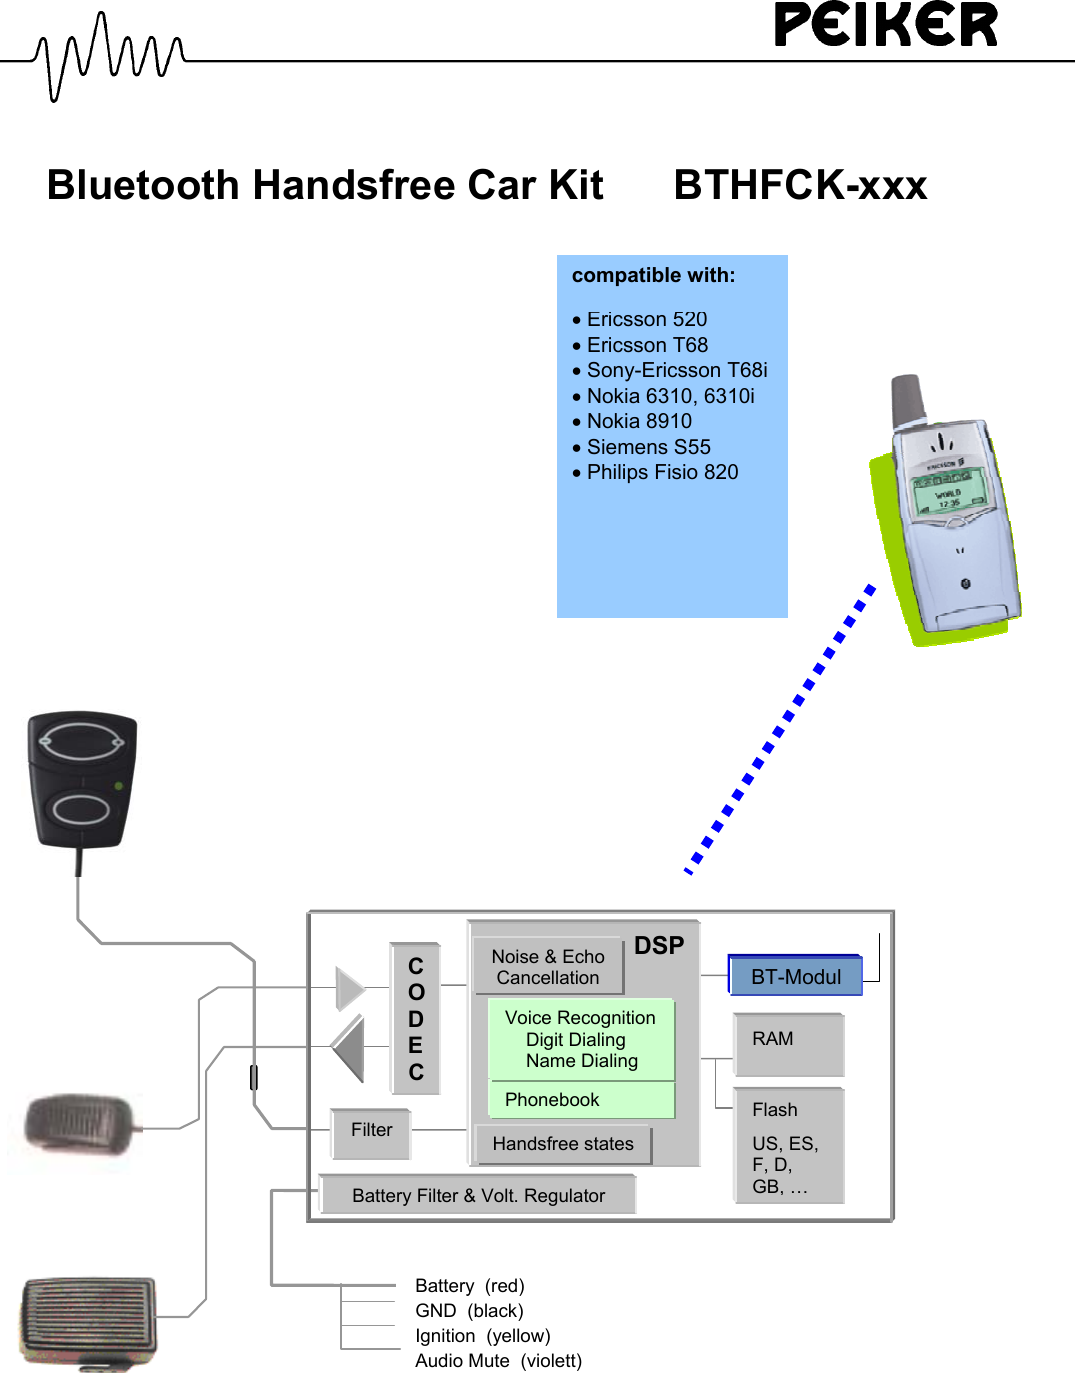 Peiker acustic and KG BTHCFK Bluetooth Headset BT-HFCK-C ... on